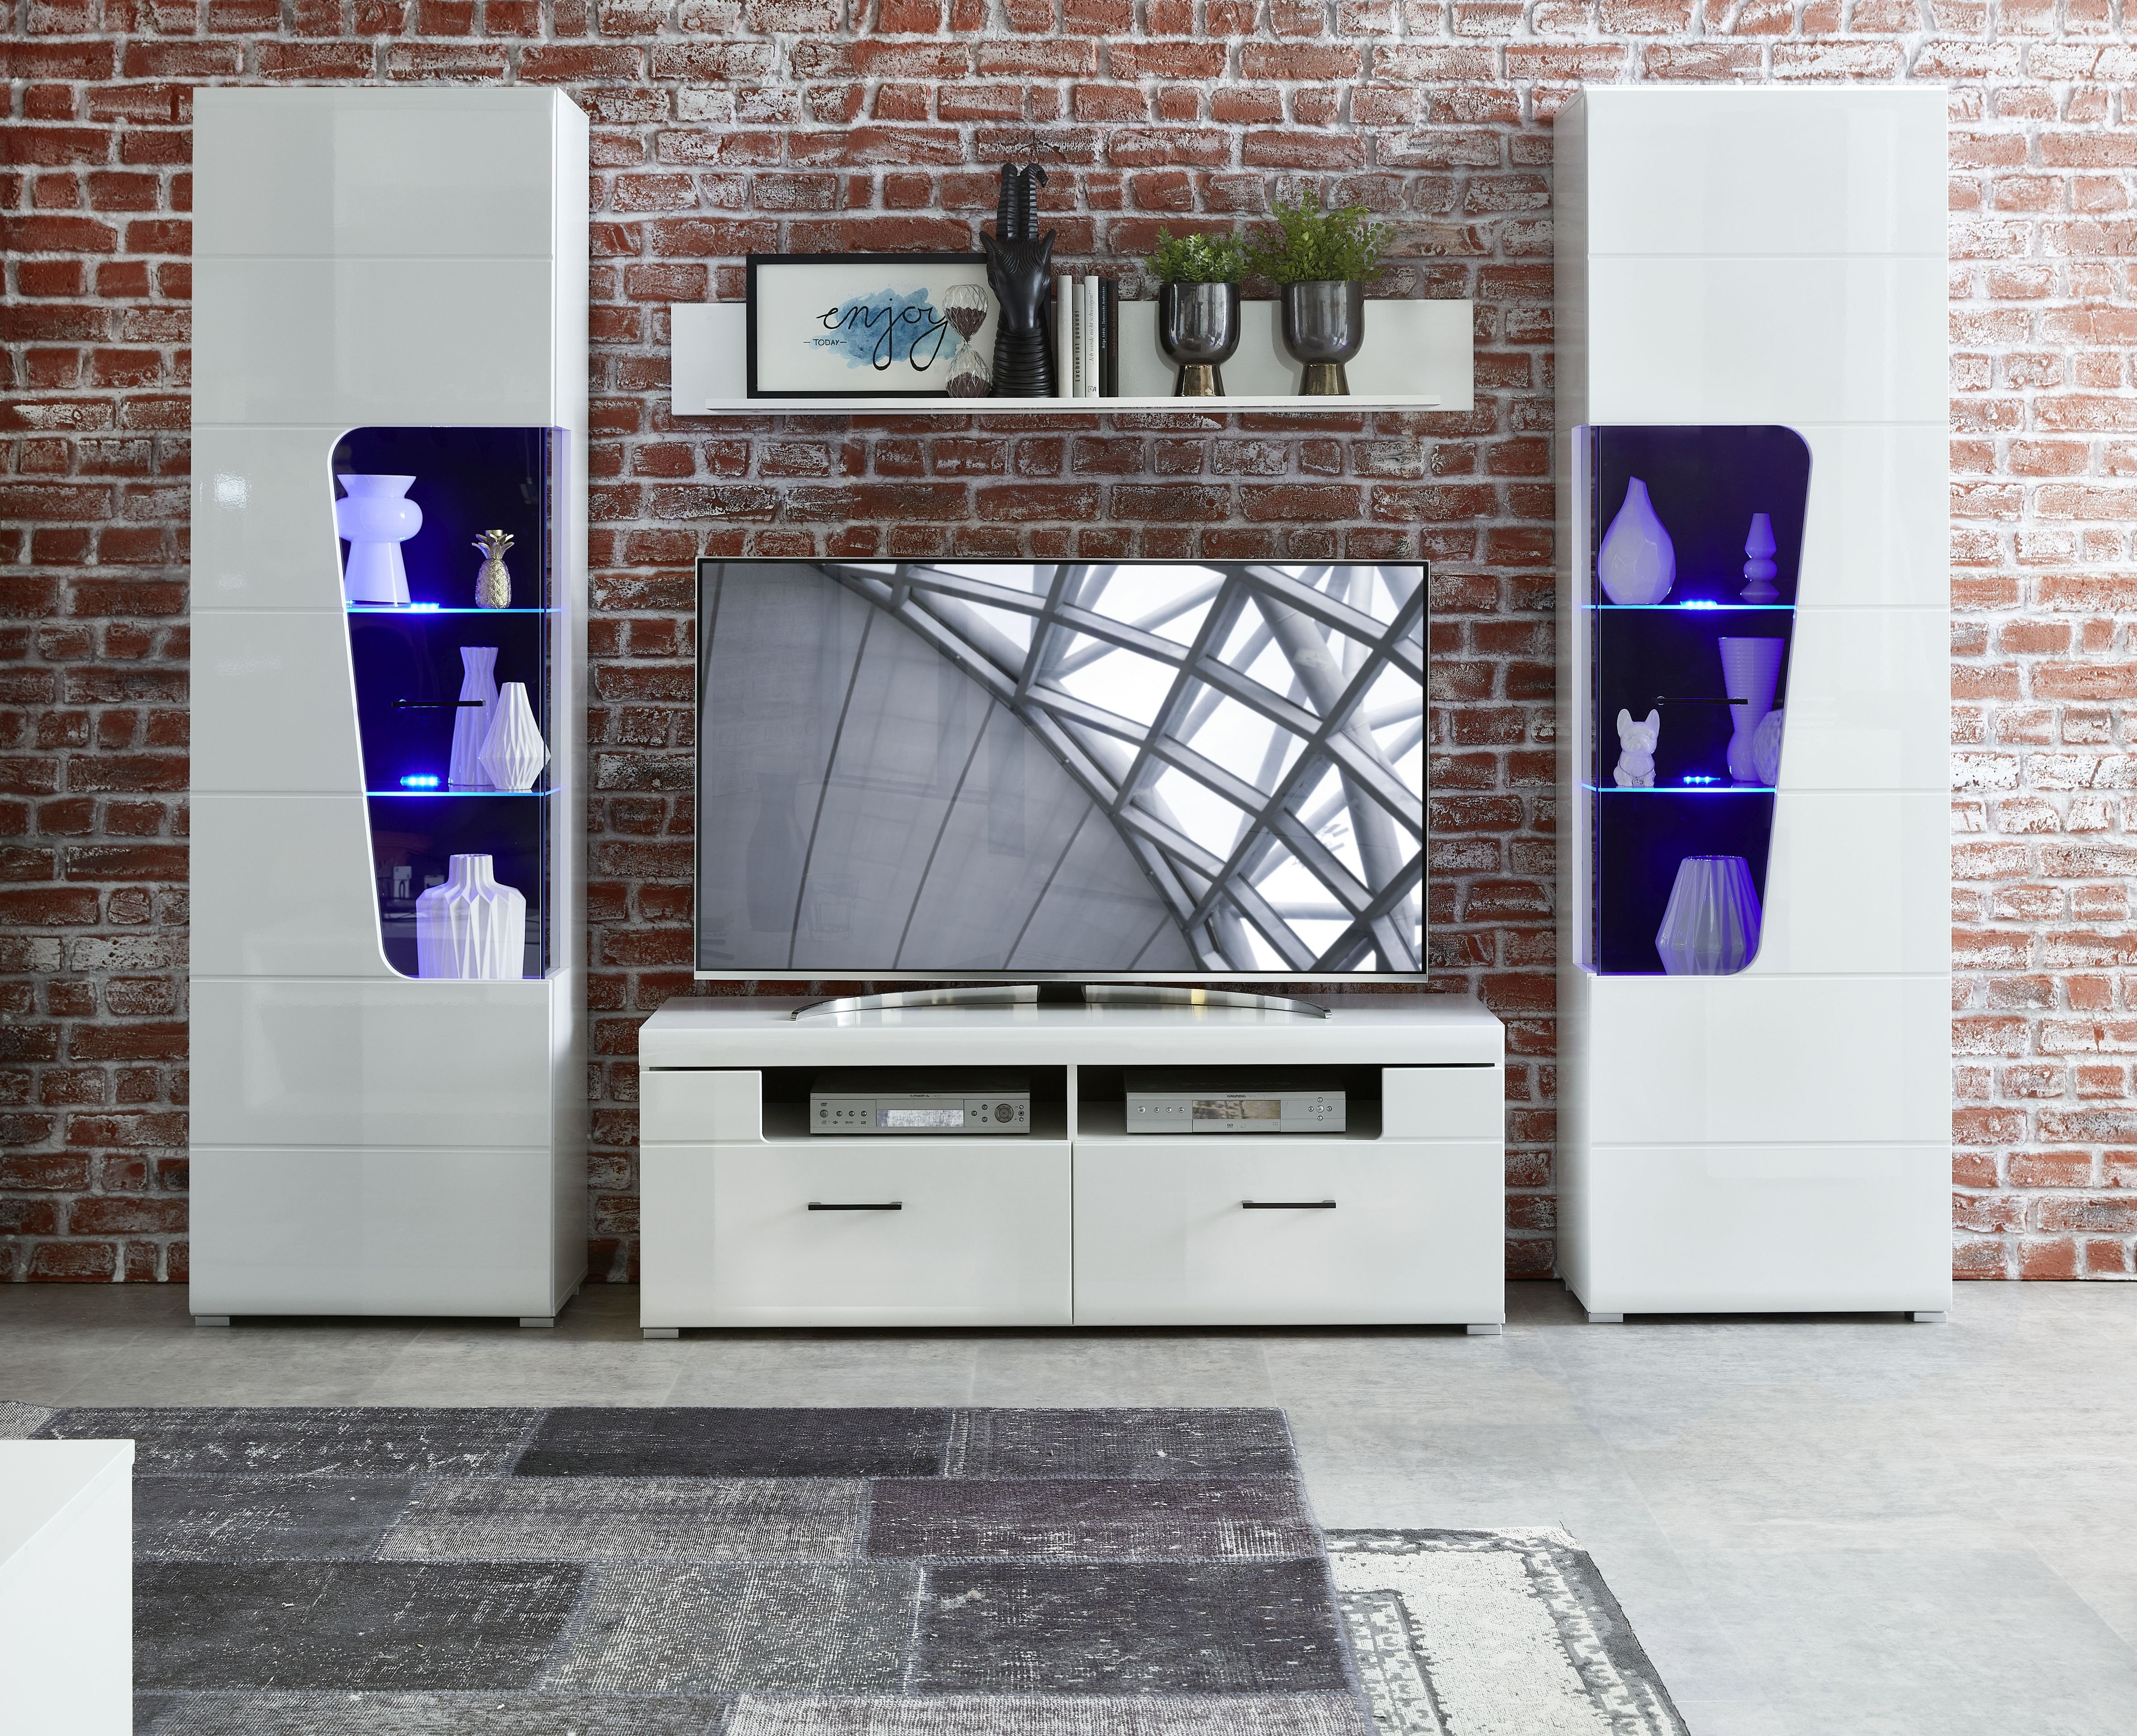 FUNNY PLUS TV-/Wohnlös.+B weiß/weiß HG MDF/Schwarz B/H/T ca. 304/205/47 cm